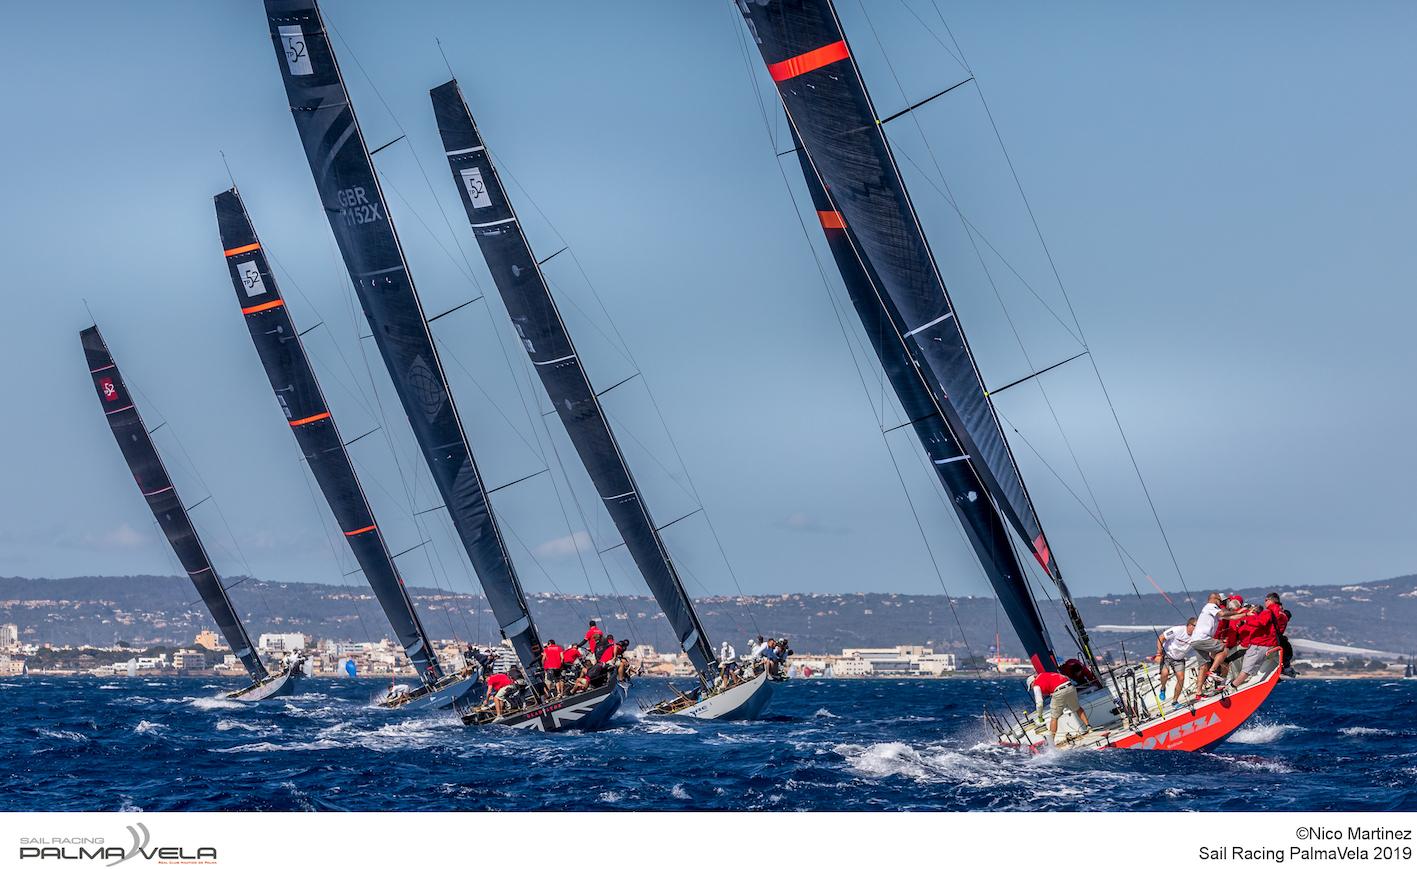 YCCS members at Sailracing Palma, J/70 Cup and the Regata dei Tre Golfi - NEWS - Yacht Club Costa Smeralda